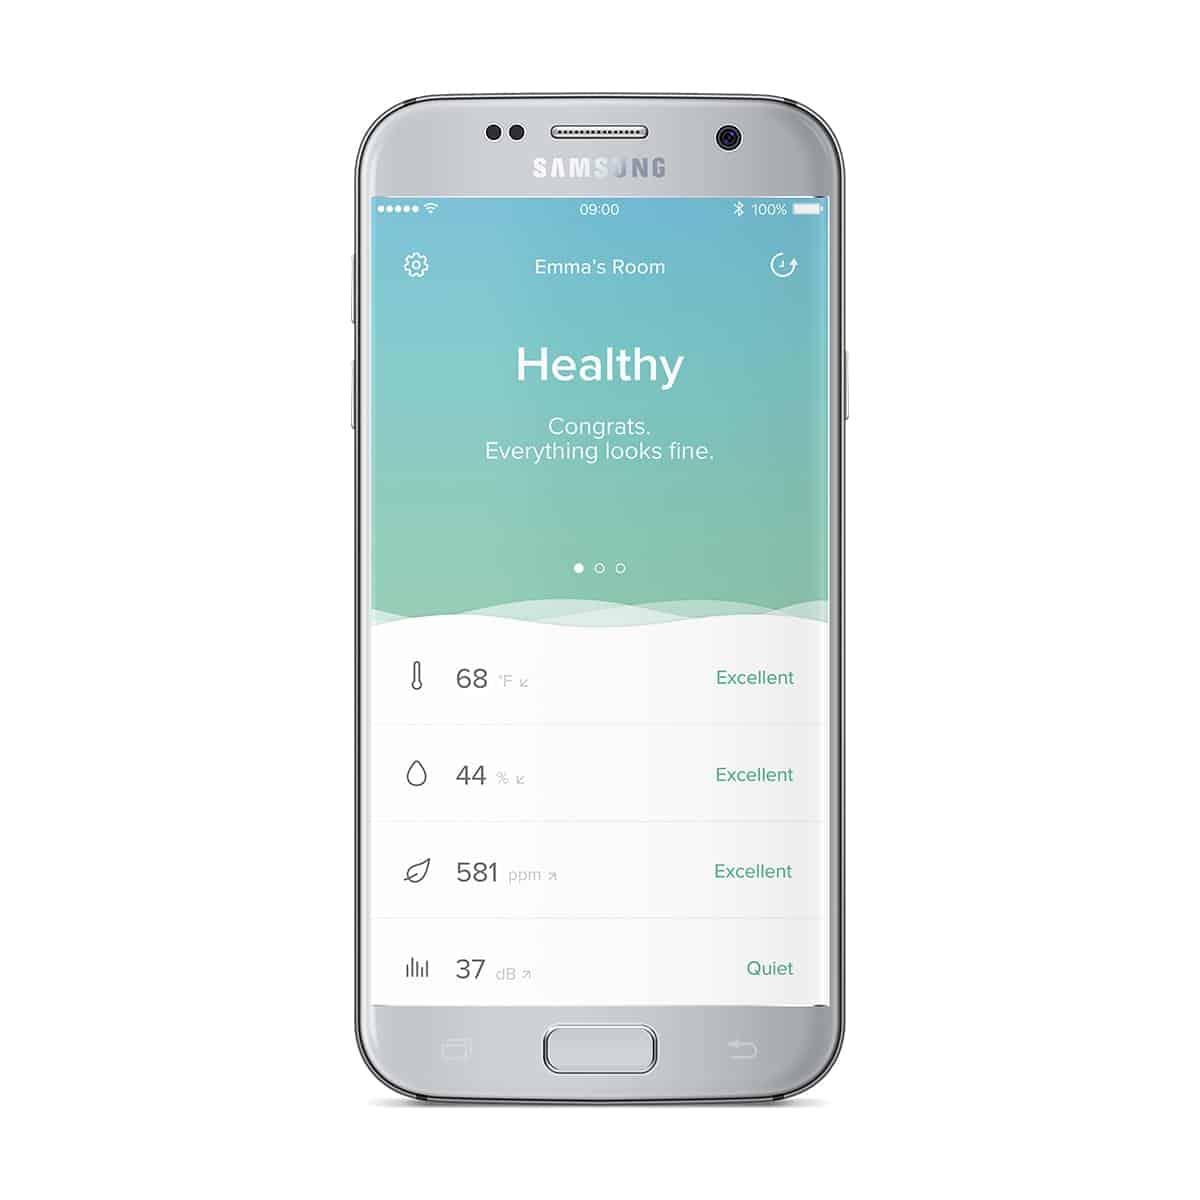 SamsungS7 healthy